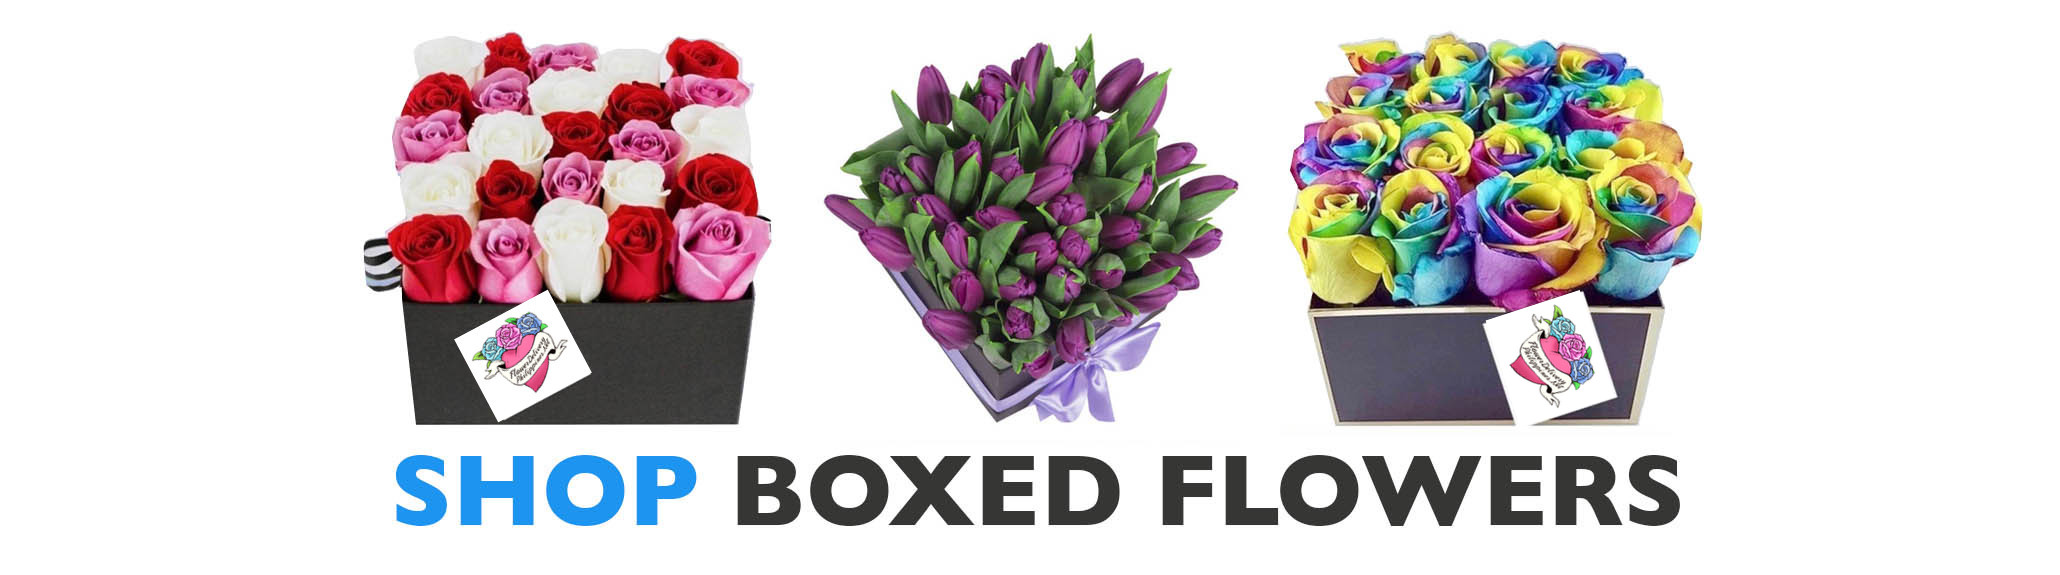 Same Day Online Flower Delivery Philippines Online Flower